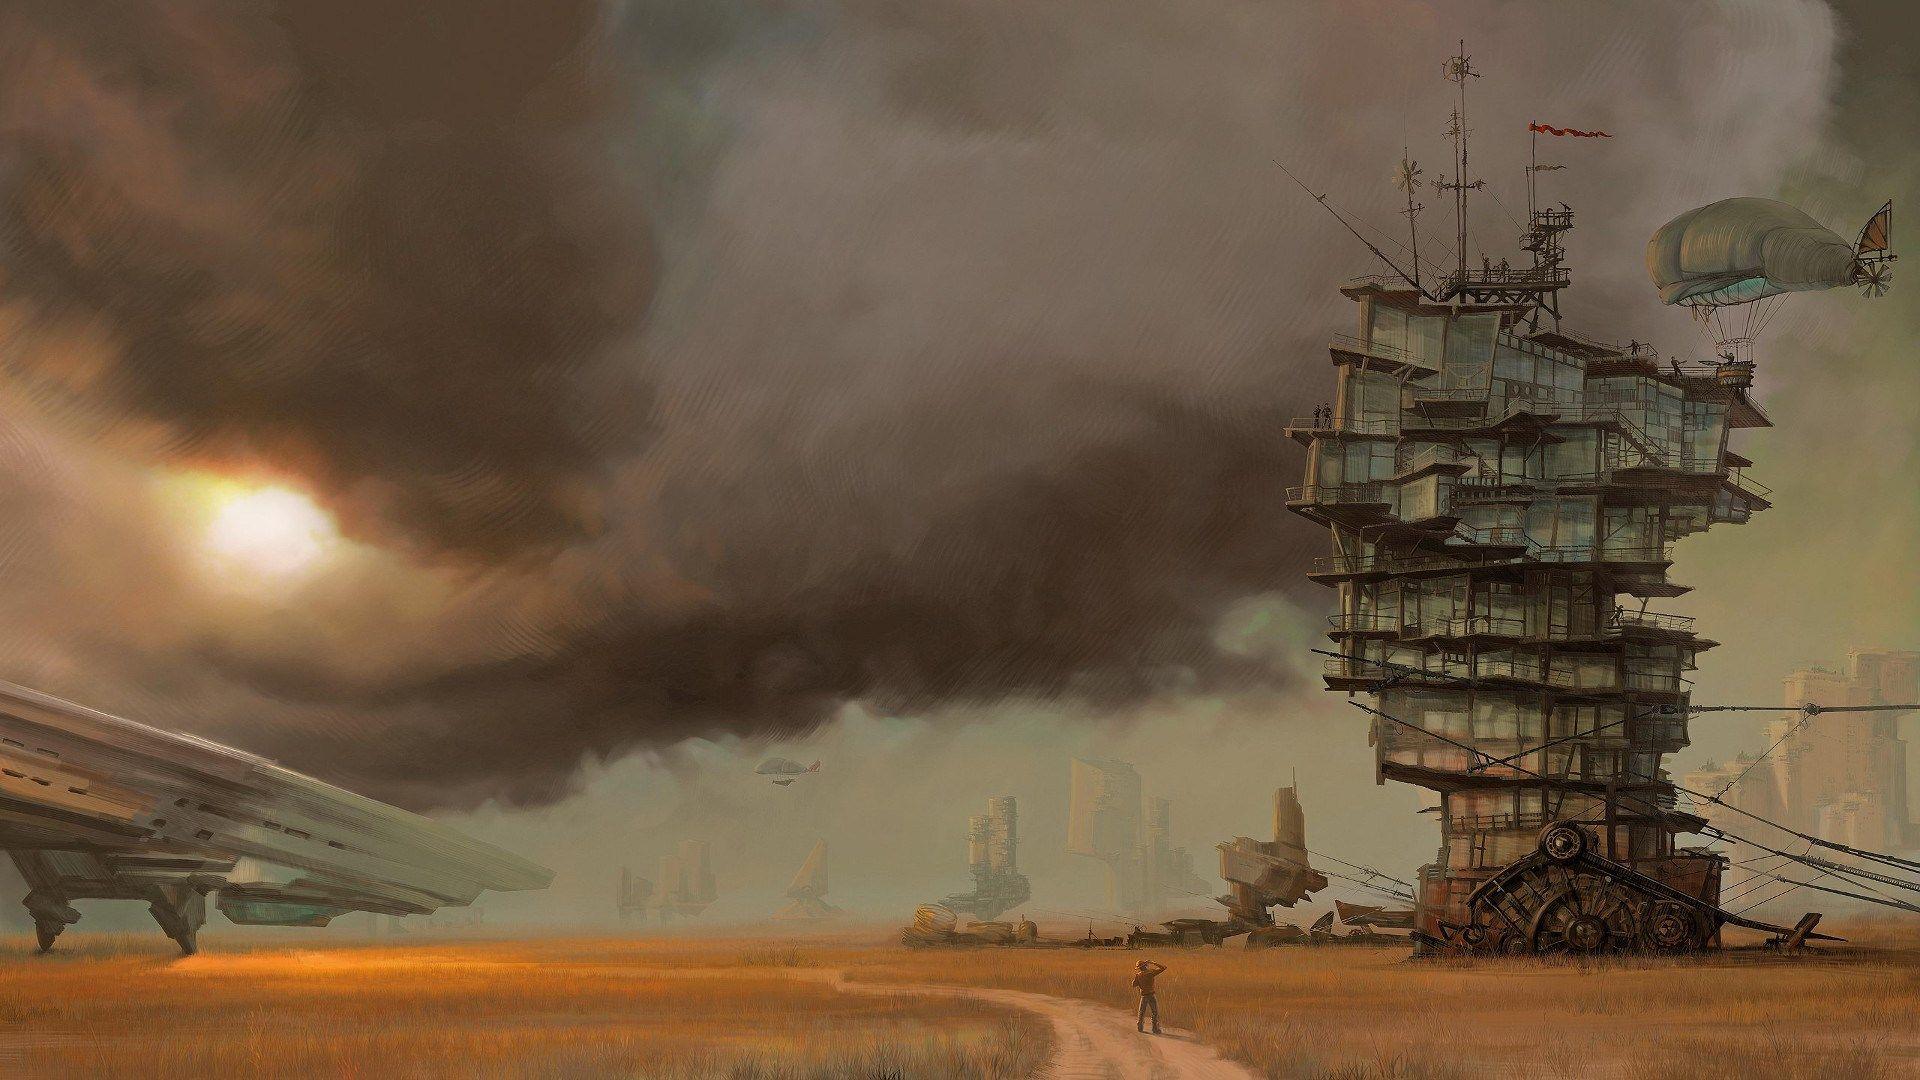 Steampunk download free wallpaper image search